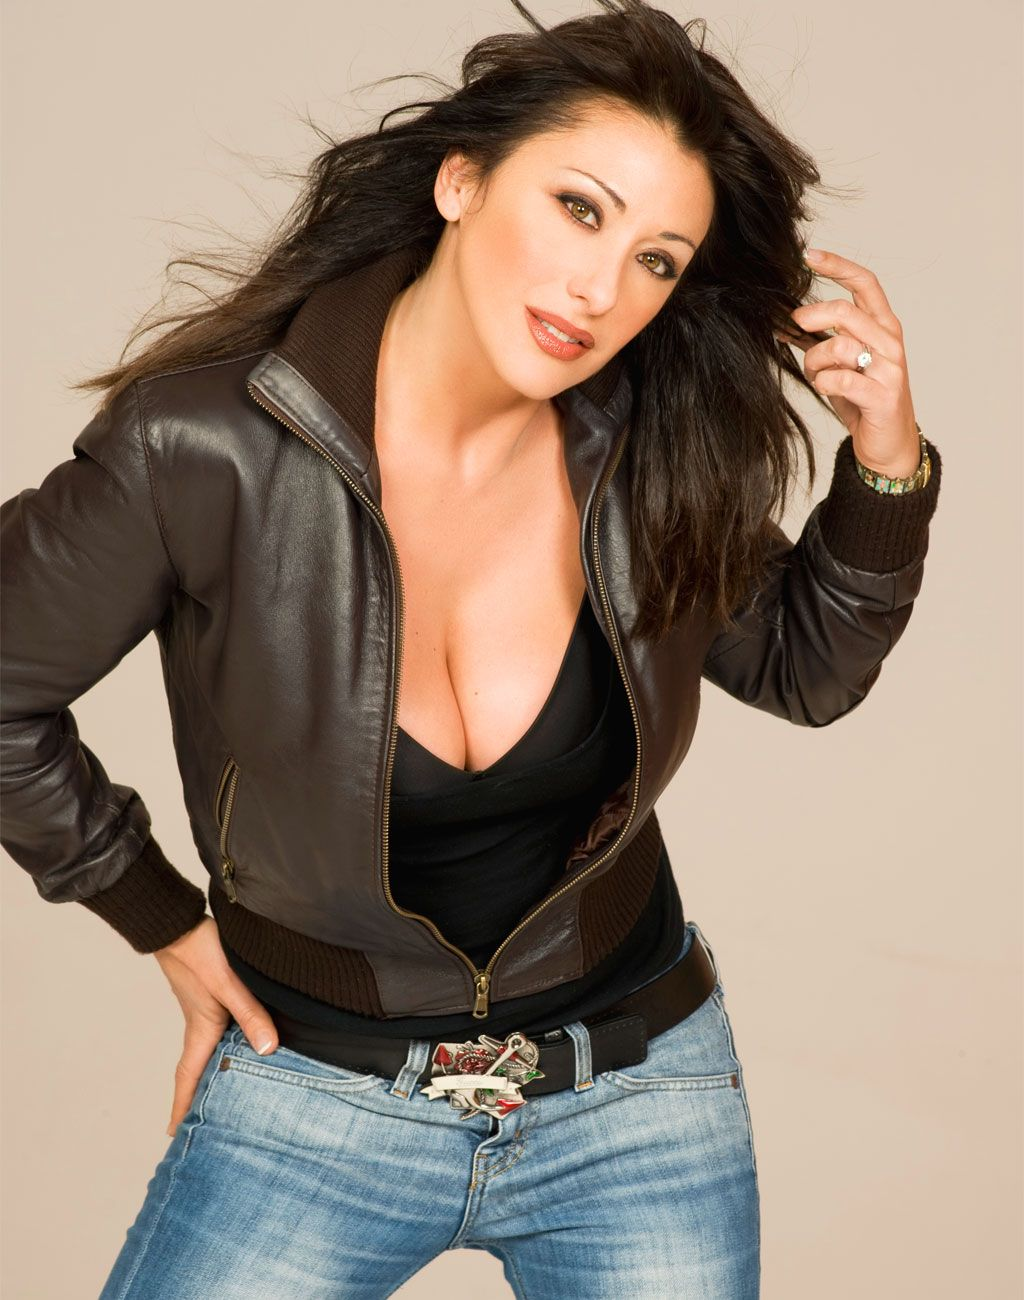 Sabrina Salerno Italy